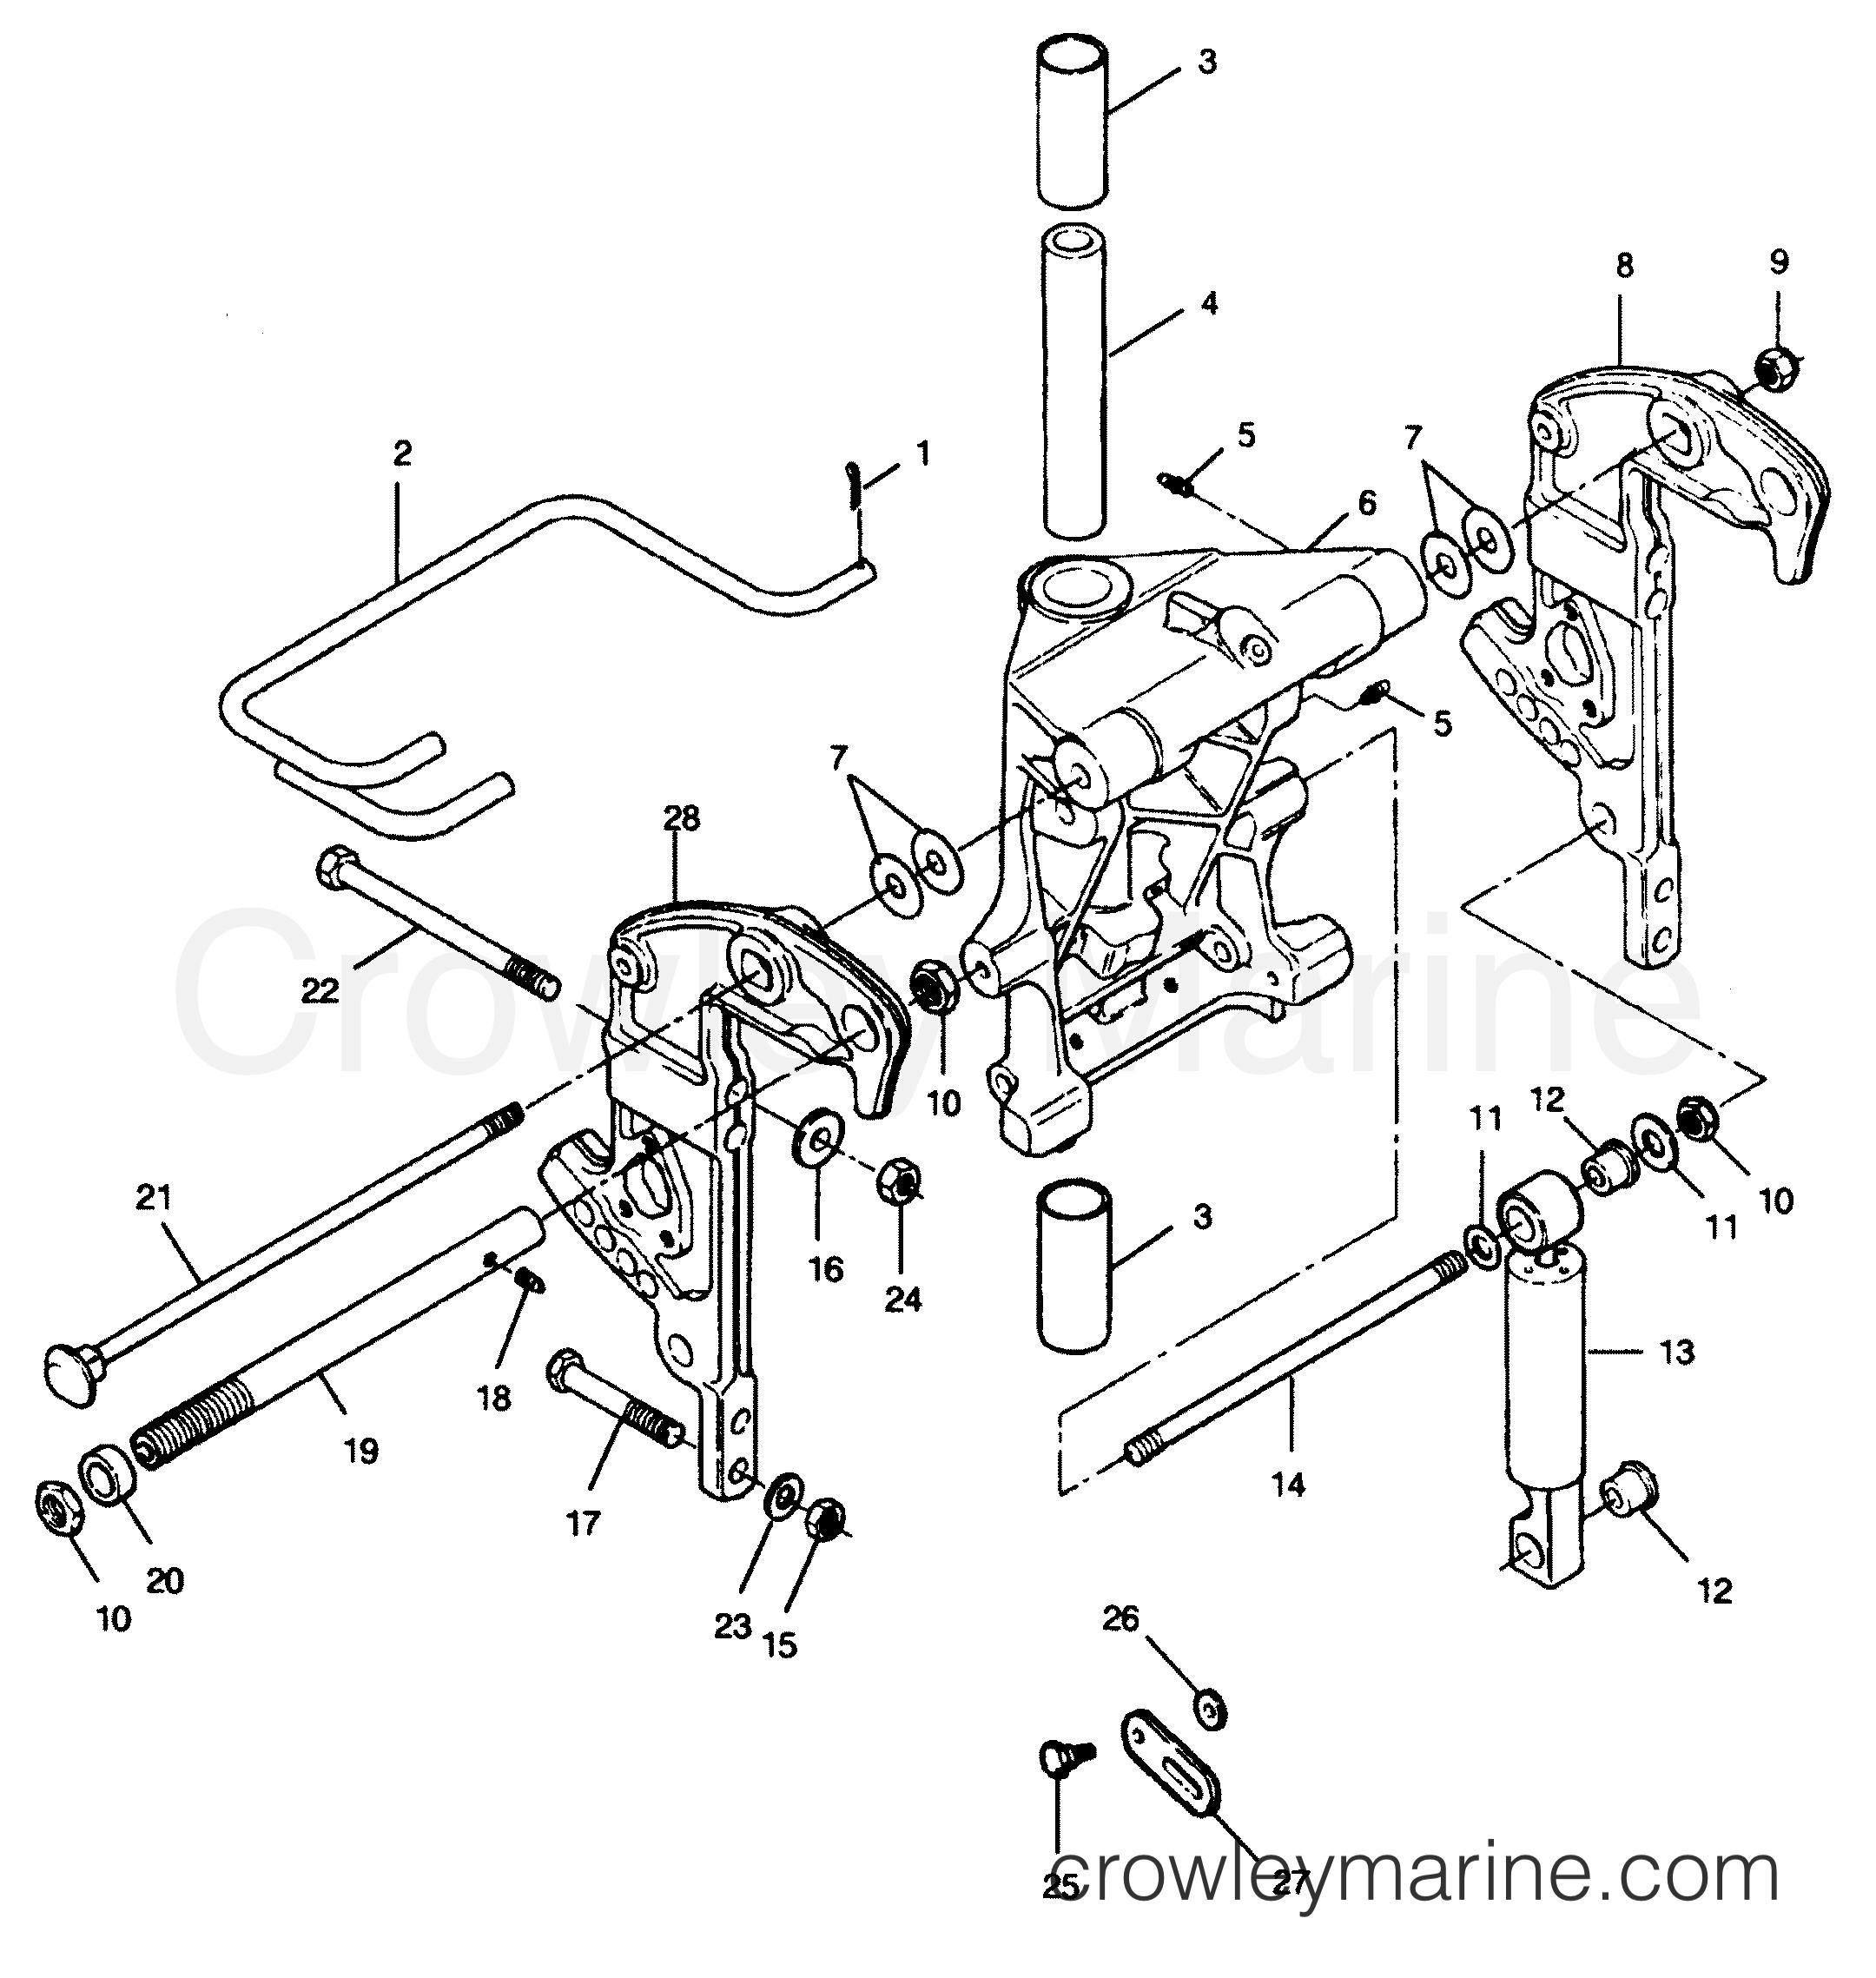 swivel bracket and stern brackets power trim models